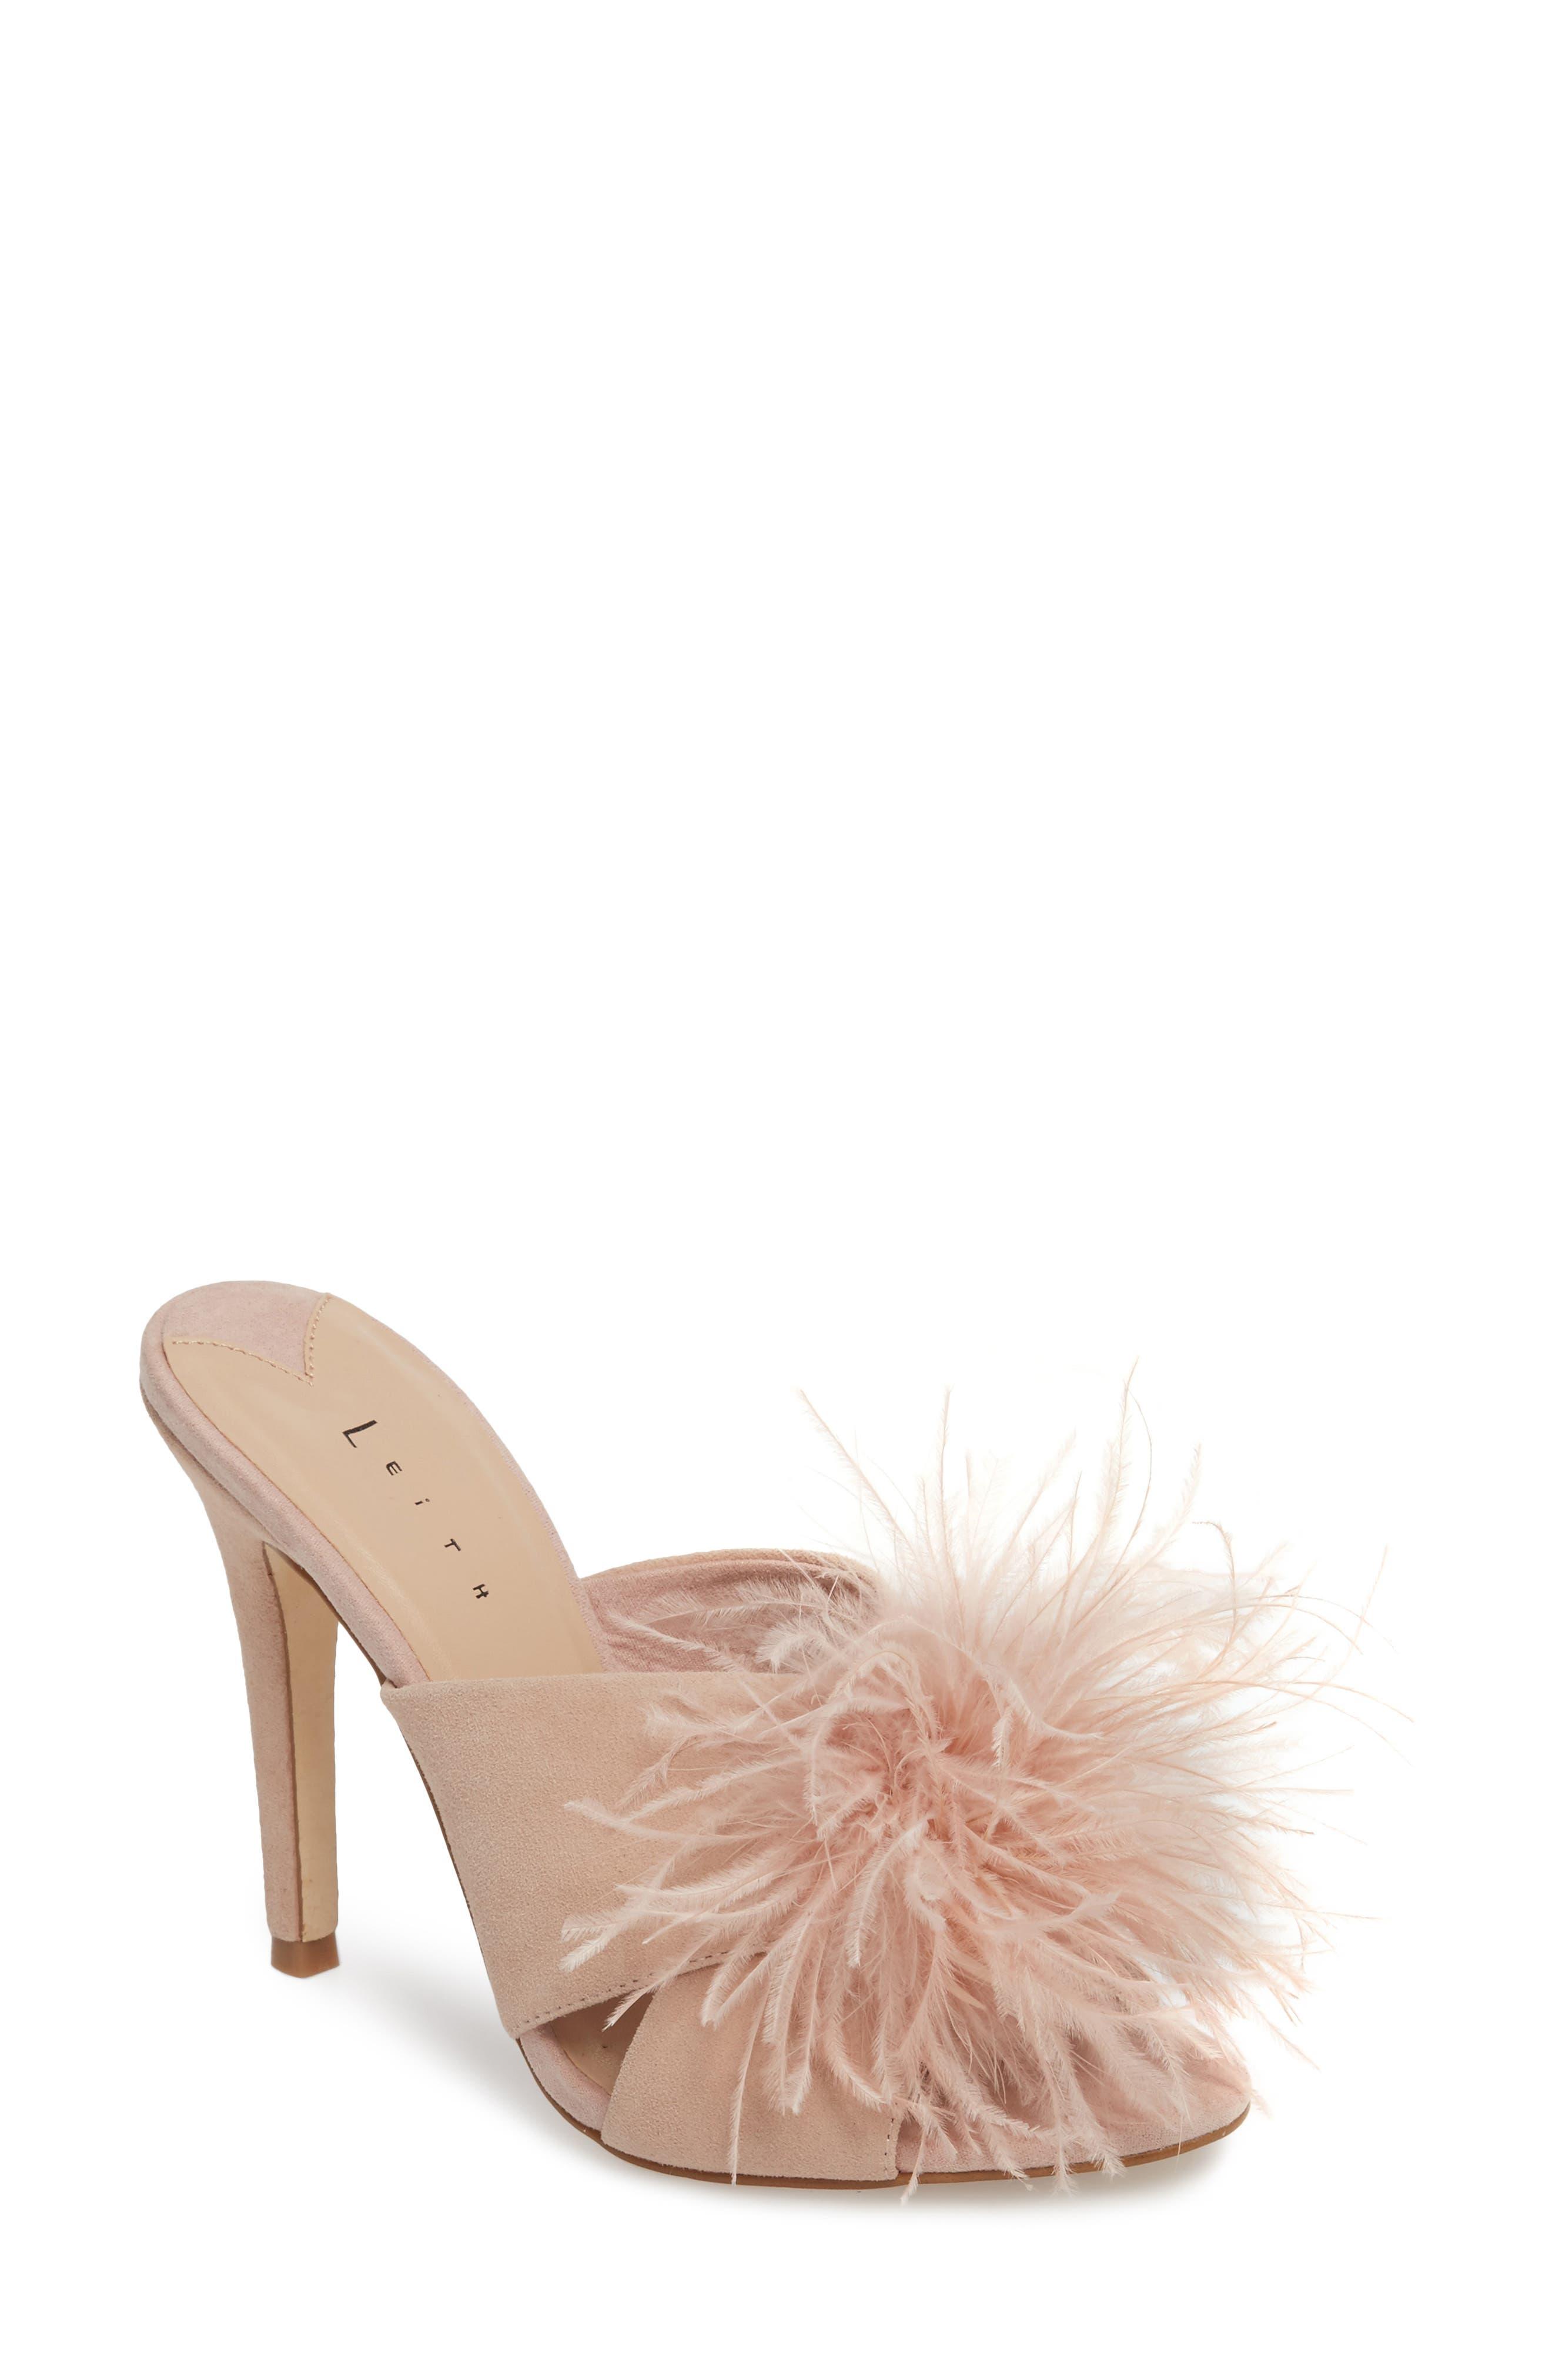 Edge Feather Sandal,                         Main,                         color, BLUSH SUEDE